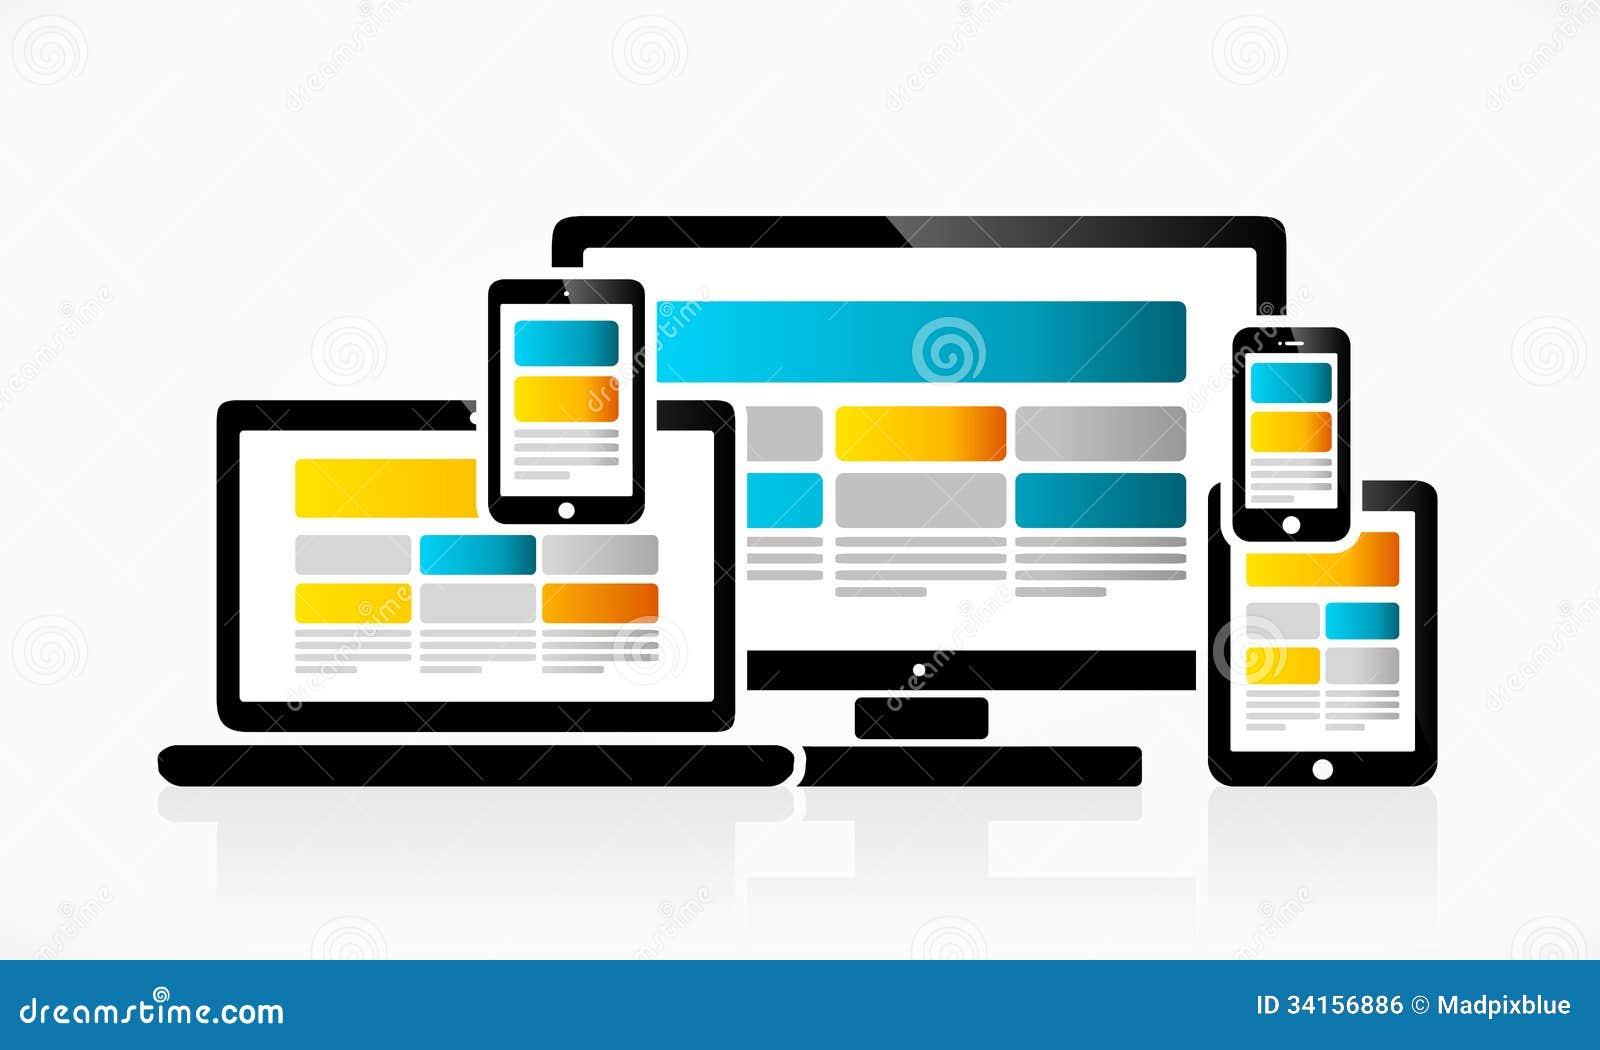 Vector Illustration Web Designs: Responsive Web Design Royalty Free Stock Image